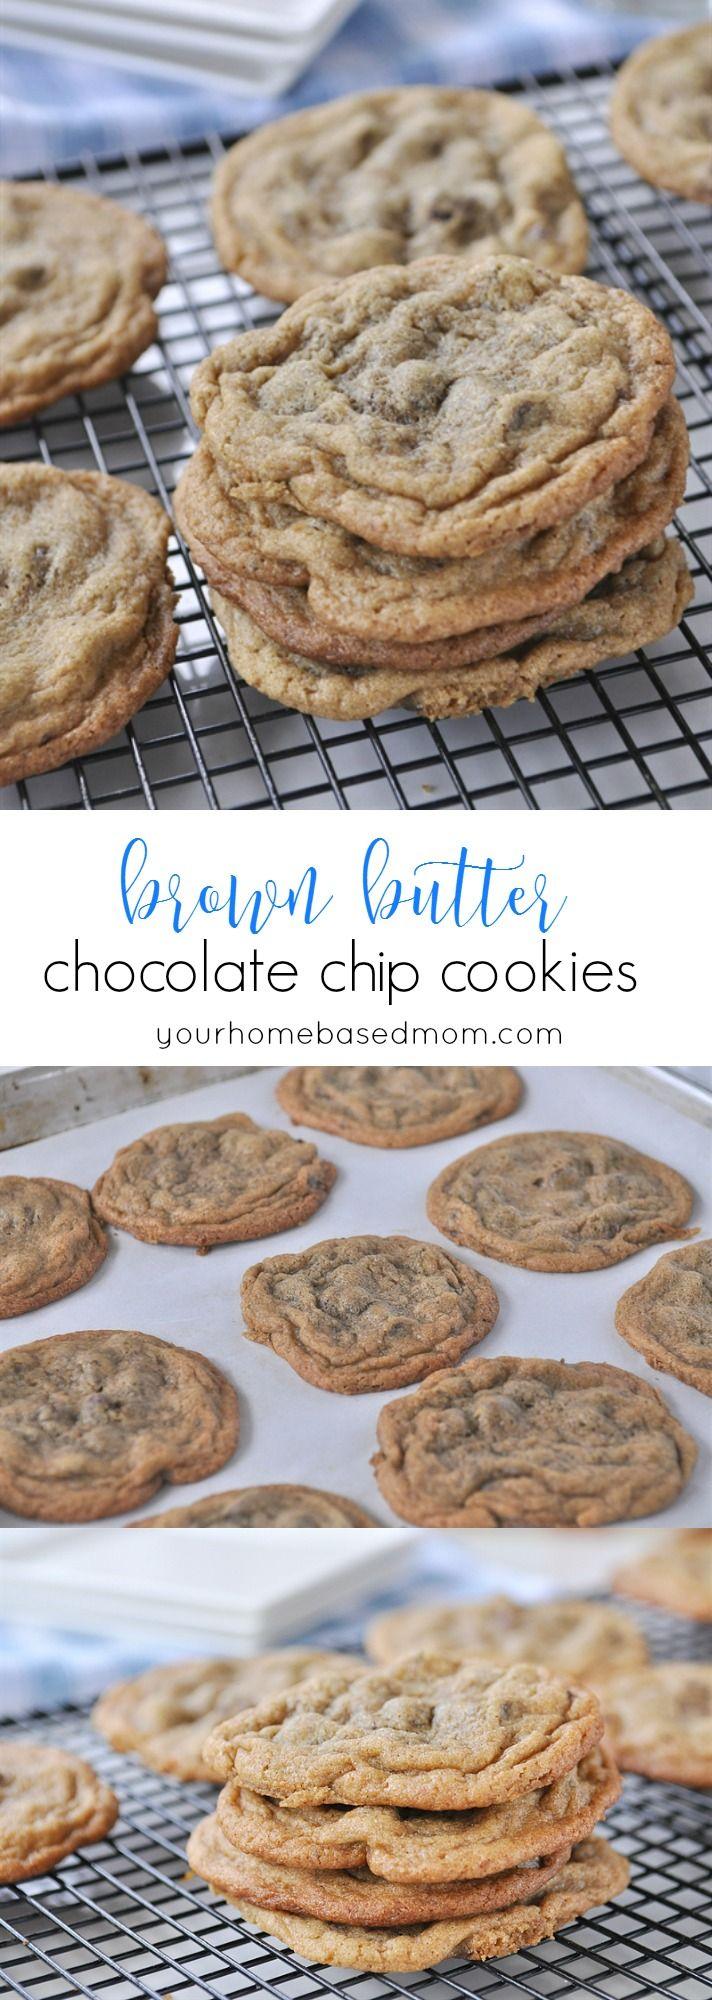 Brown Butter Chocoalte Chip Cookies - @yourhomebasedmom.com